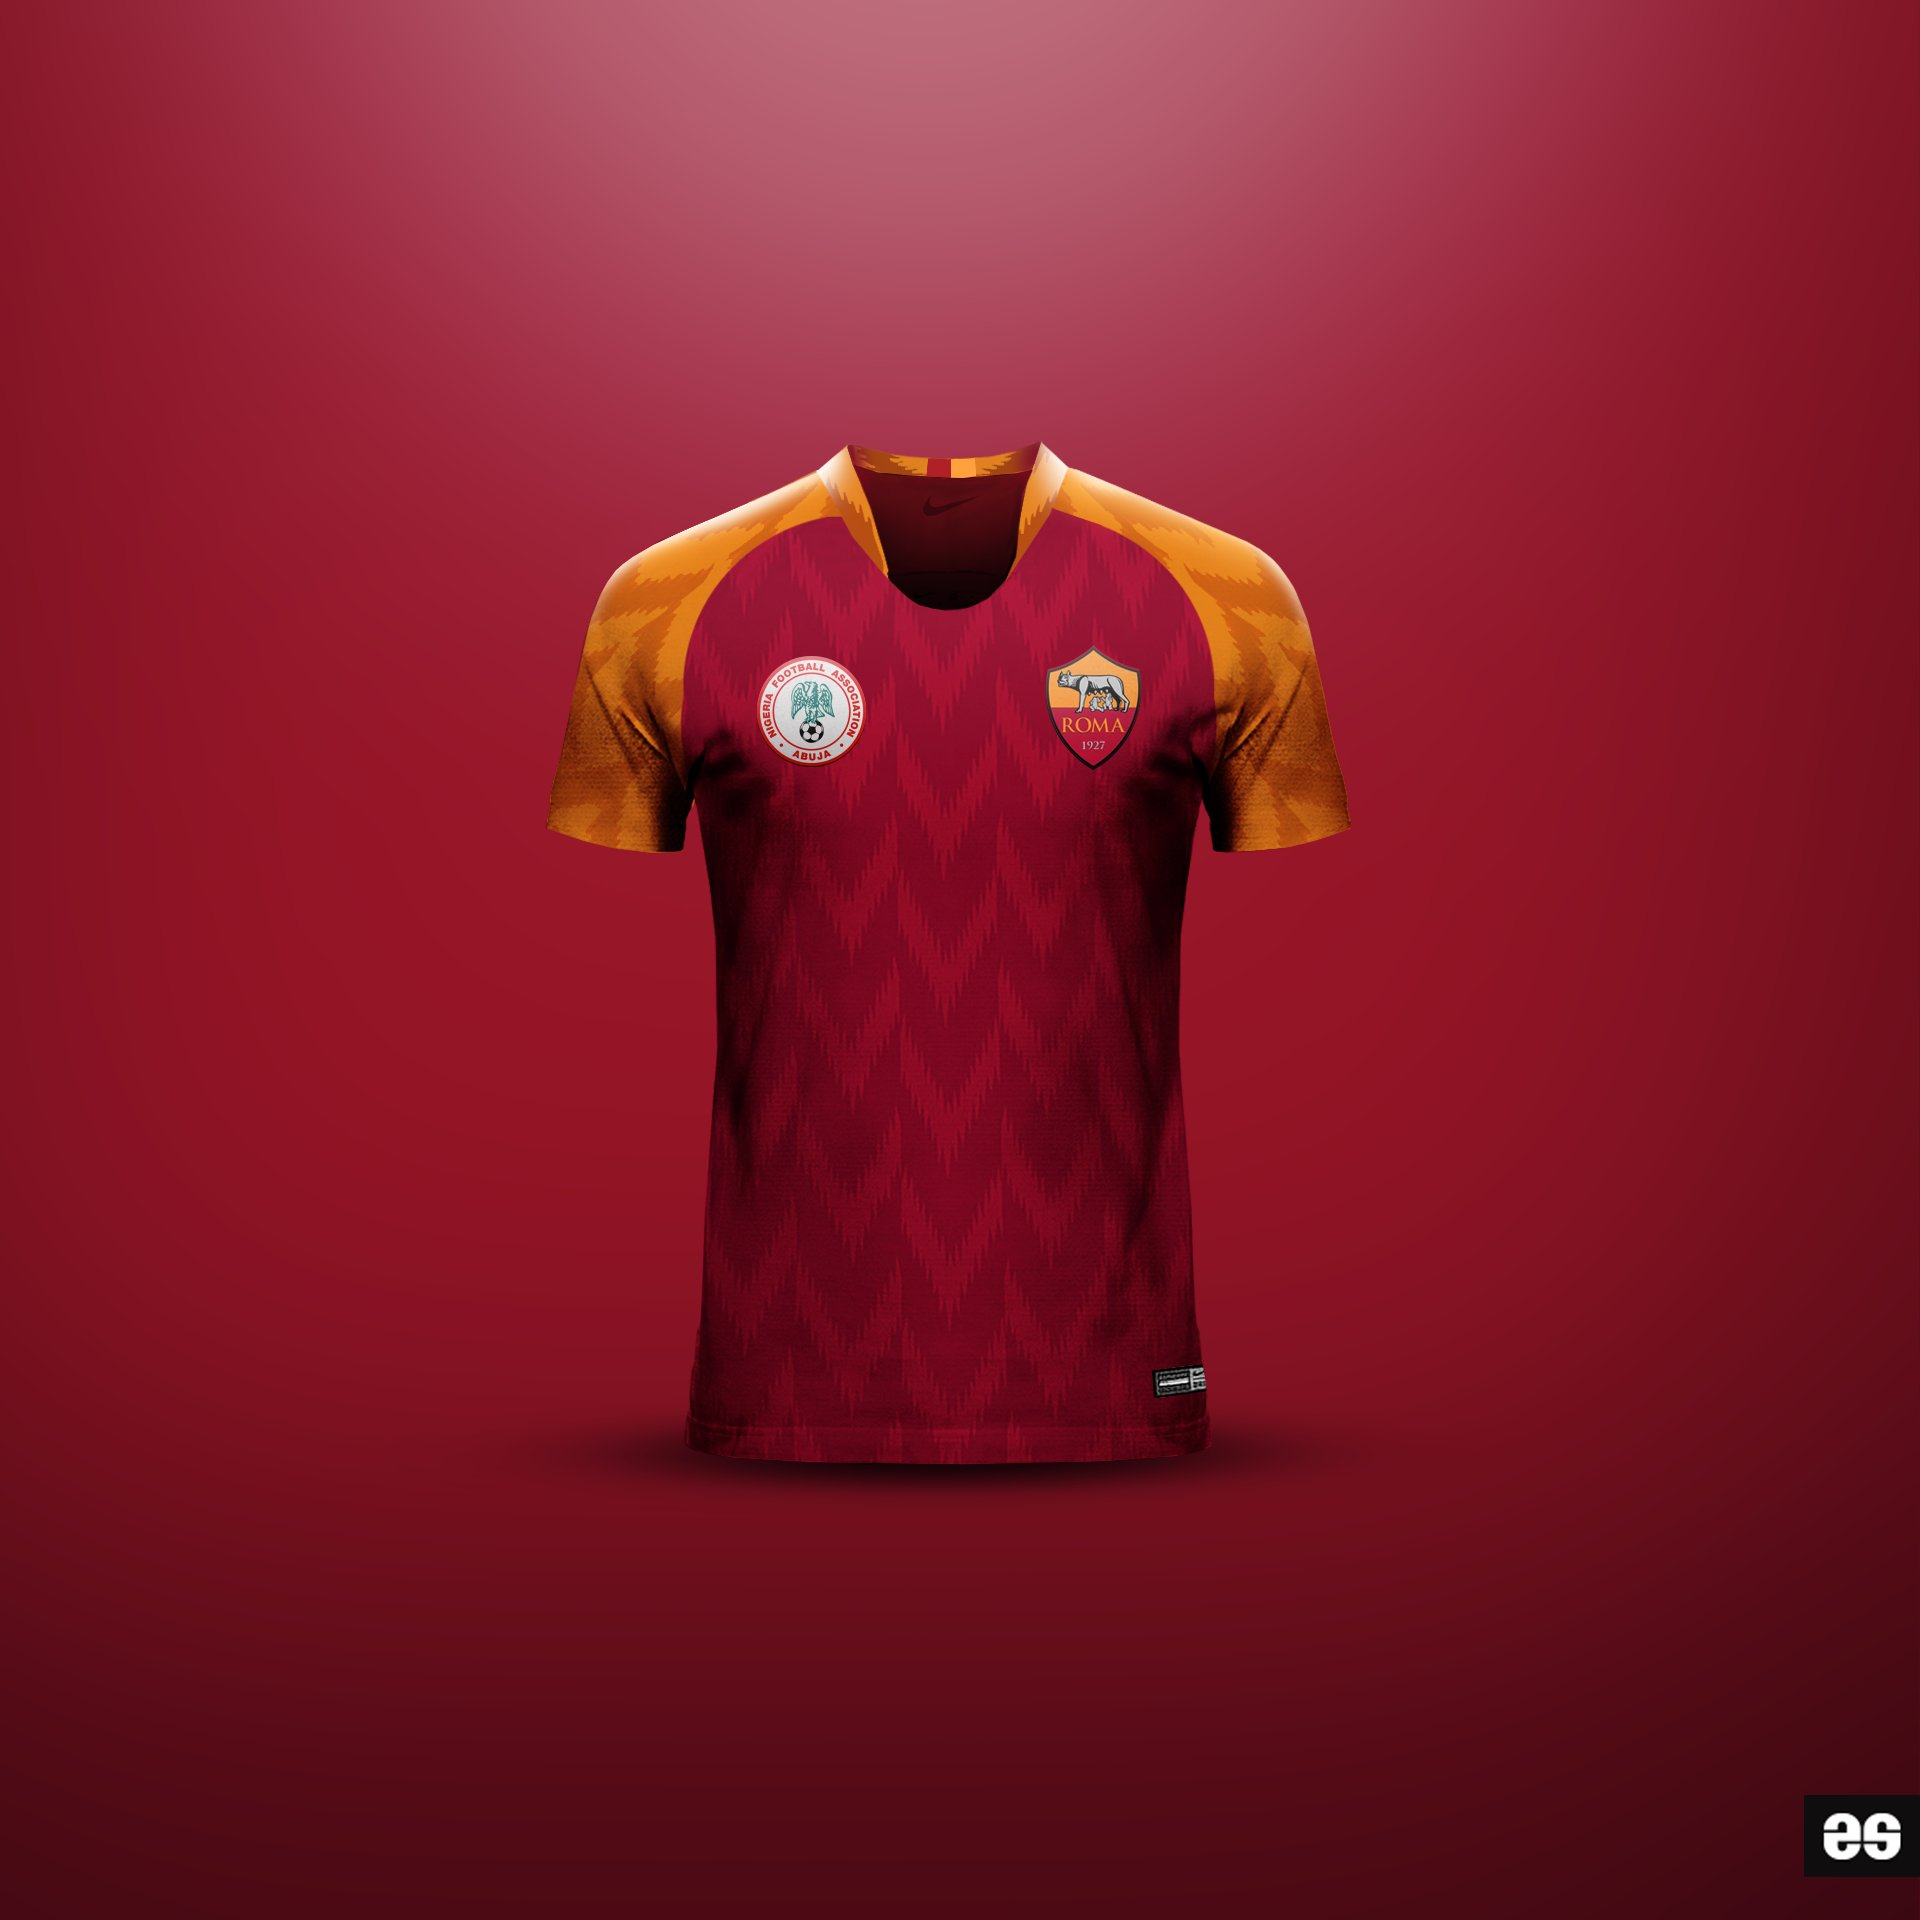 f1cf8bfb3 Roma x Nigeria by Emilio Sansolini. Follow  EmilioSansolini